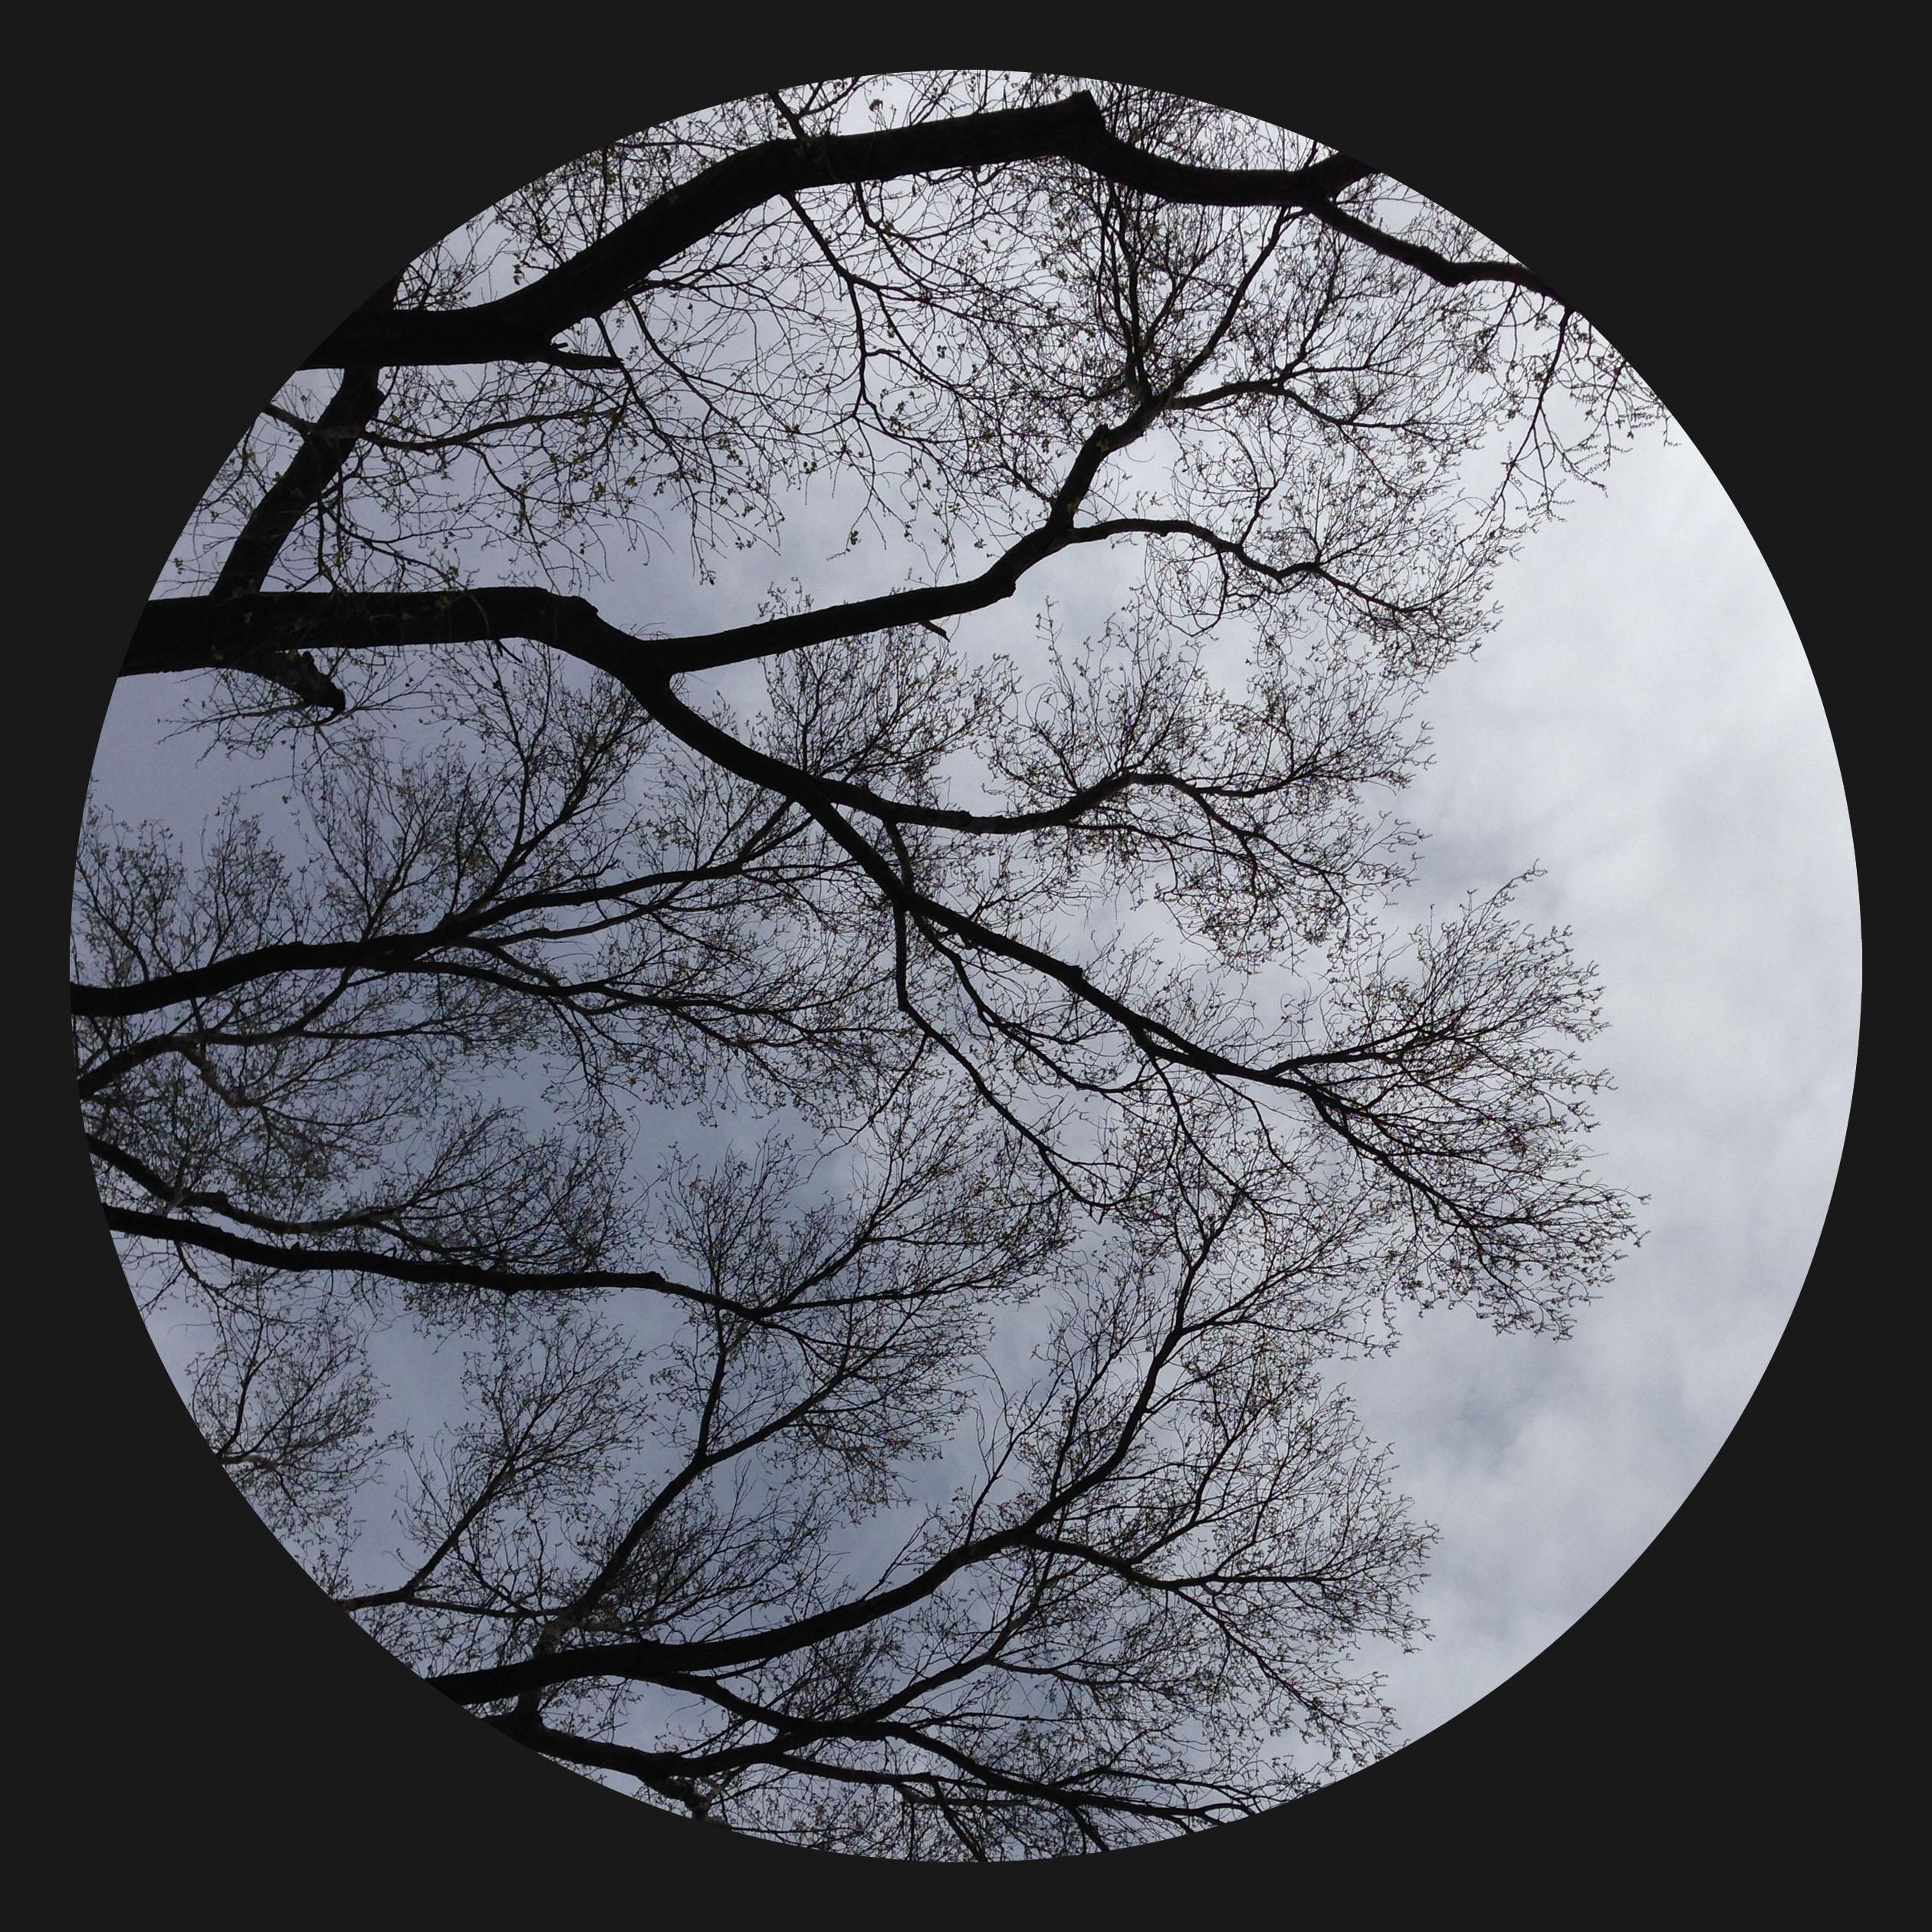 circle1-copy